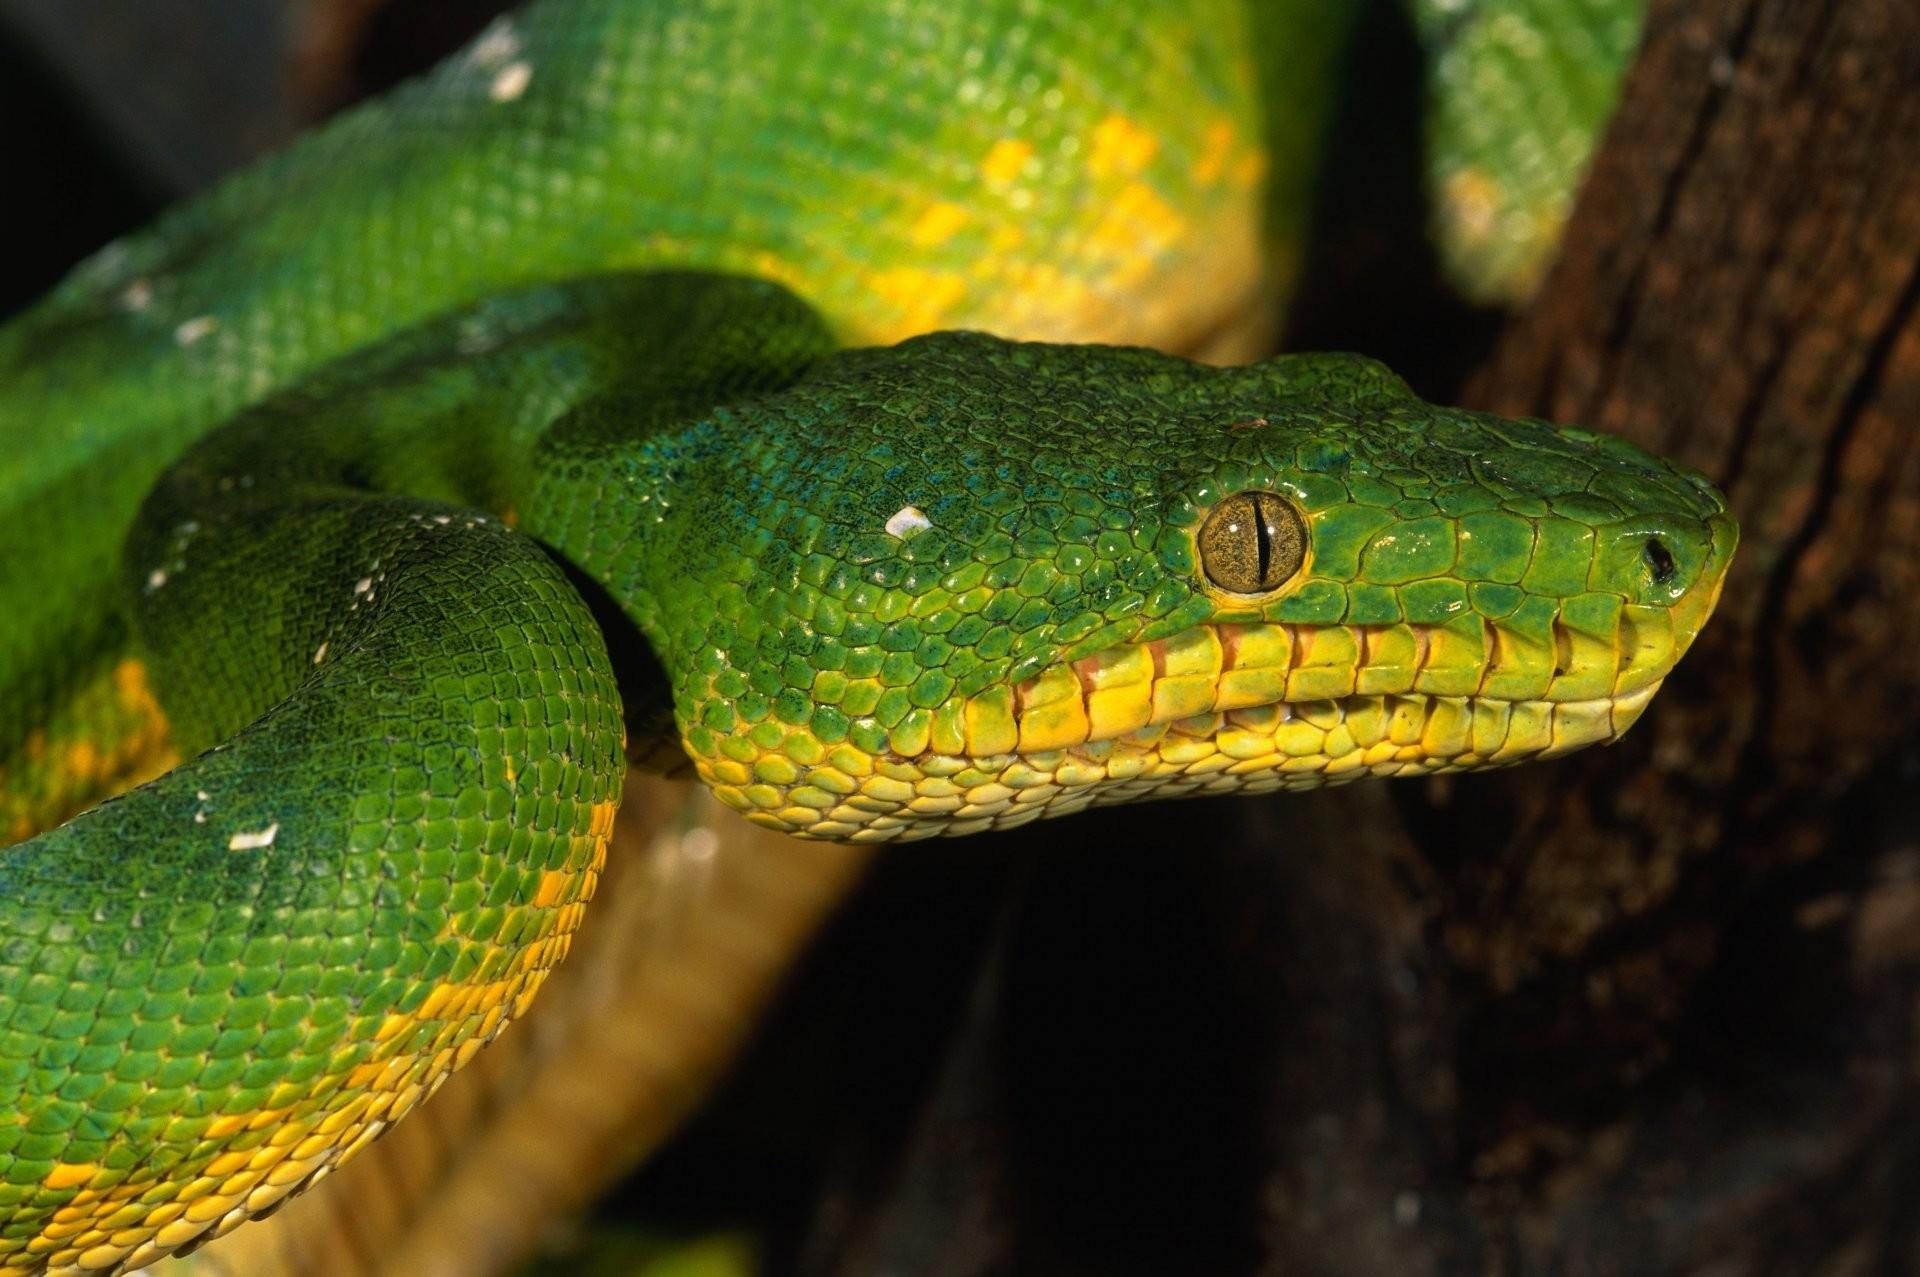 green snake eyes scales